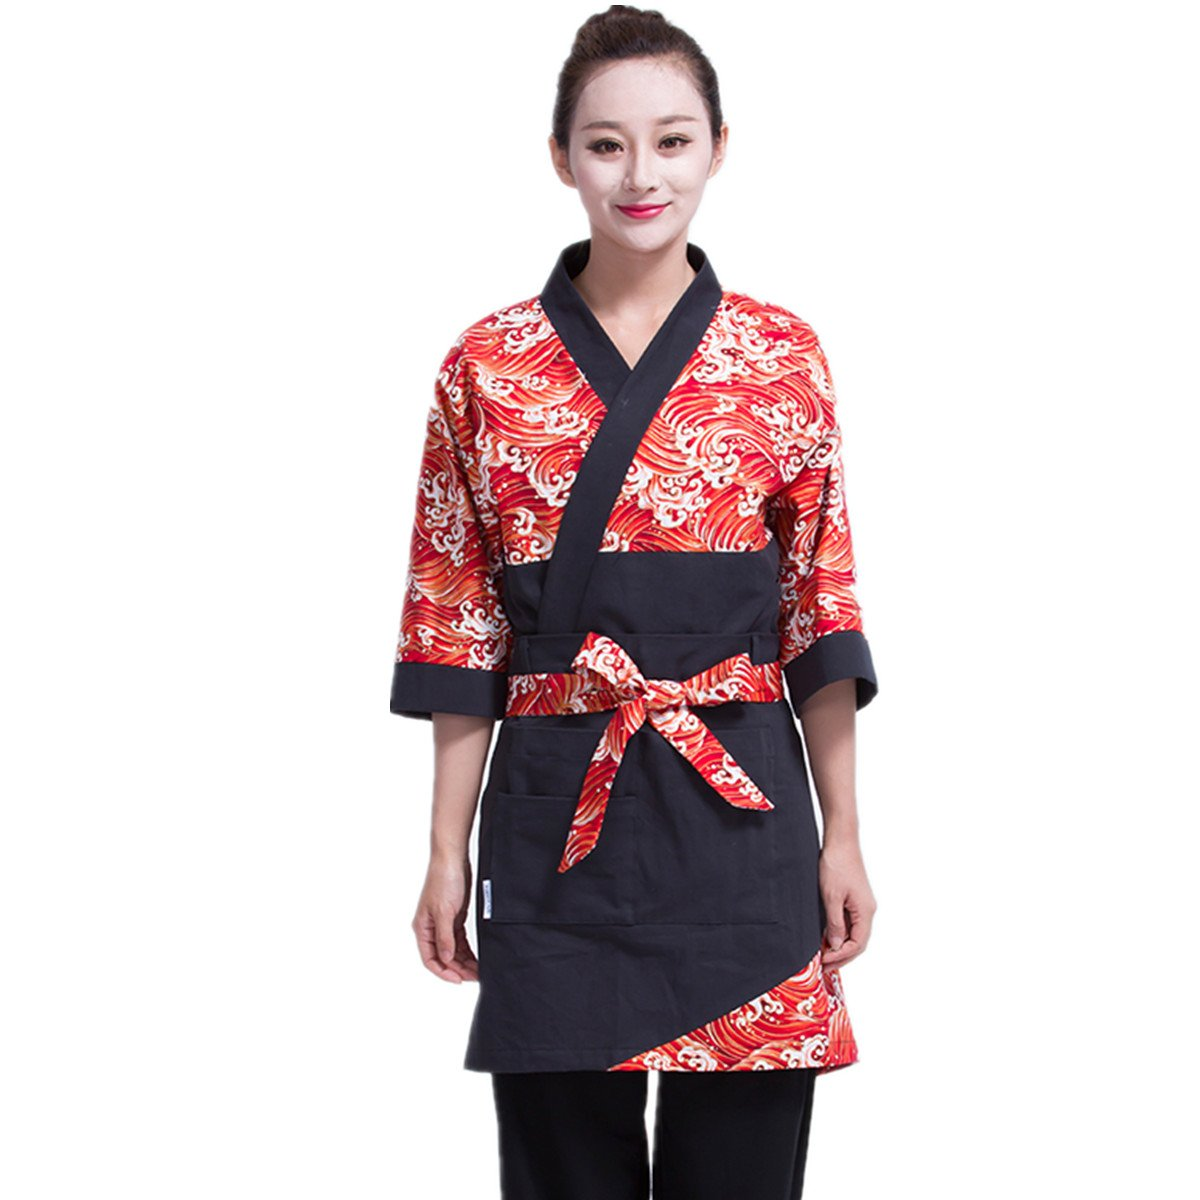 XINFU Sushi Chef Coat Wave of Kanagawa 3/4 Long Sleeve Restaurant Japanese Kitchen Work Uniform by XINFU